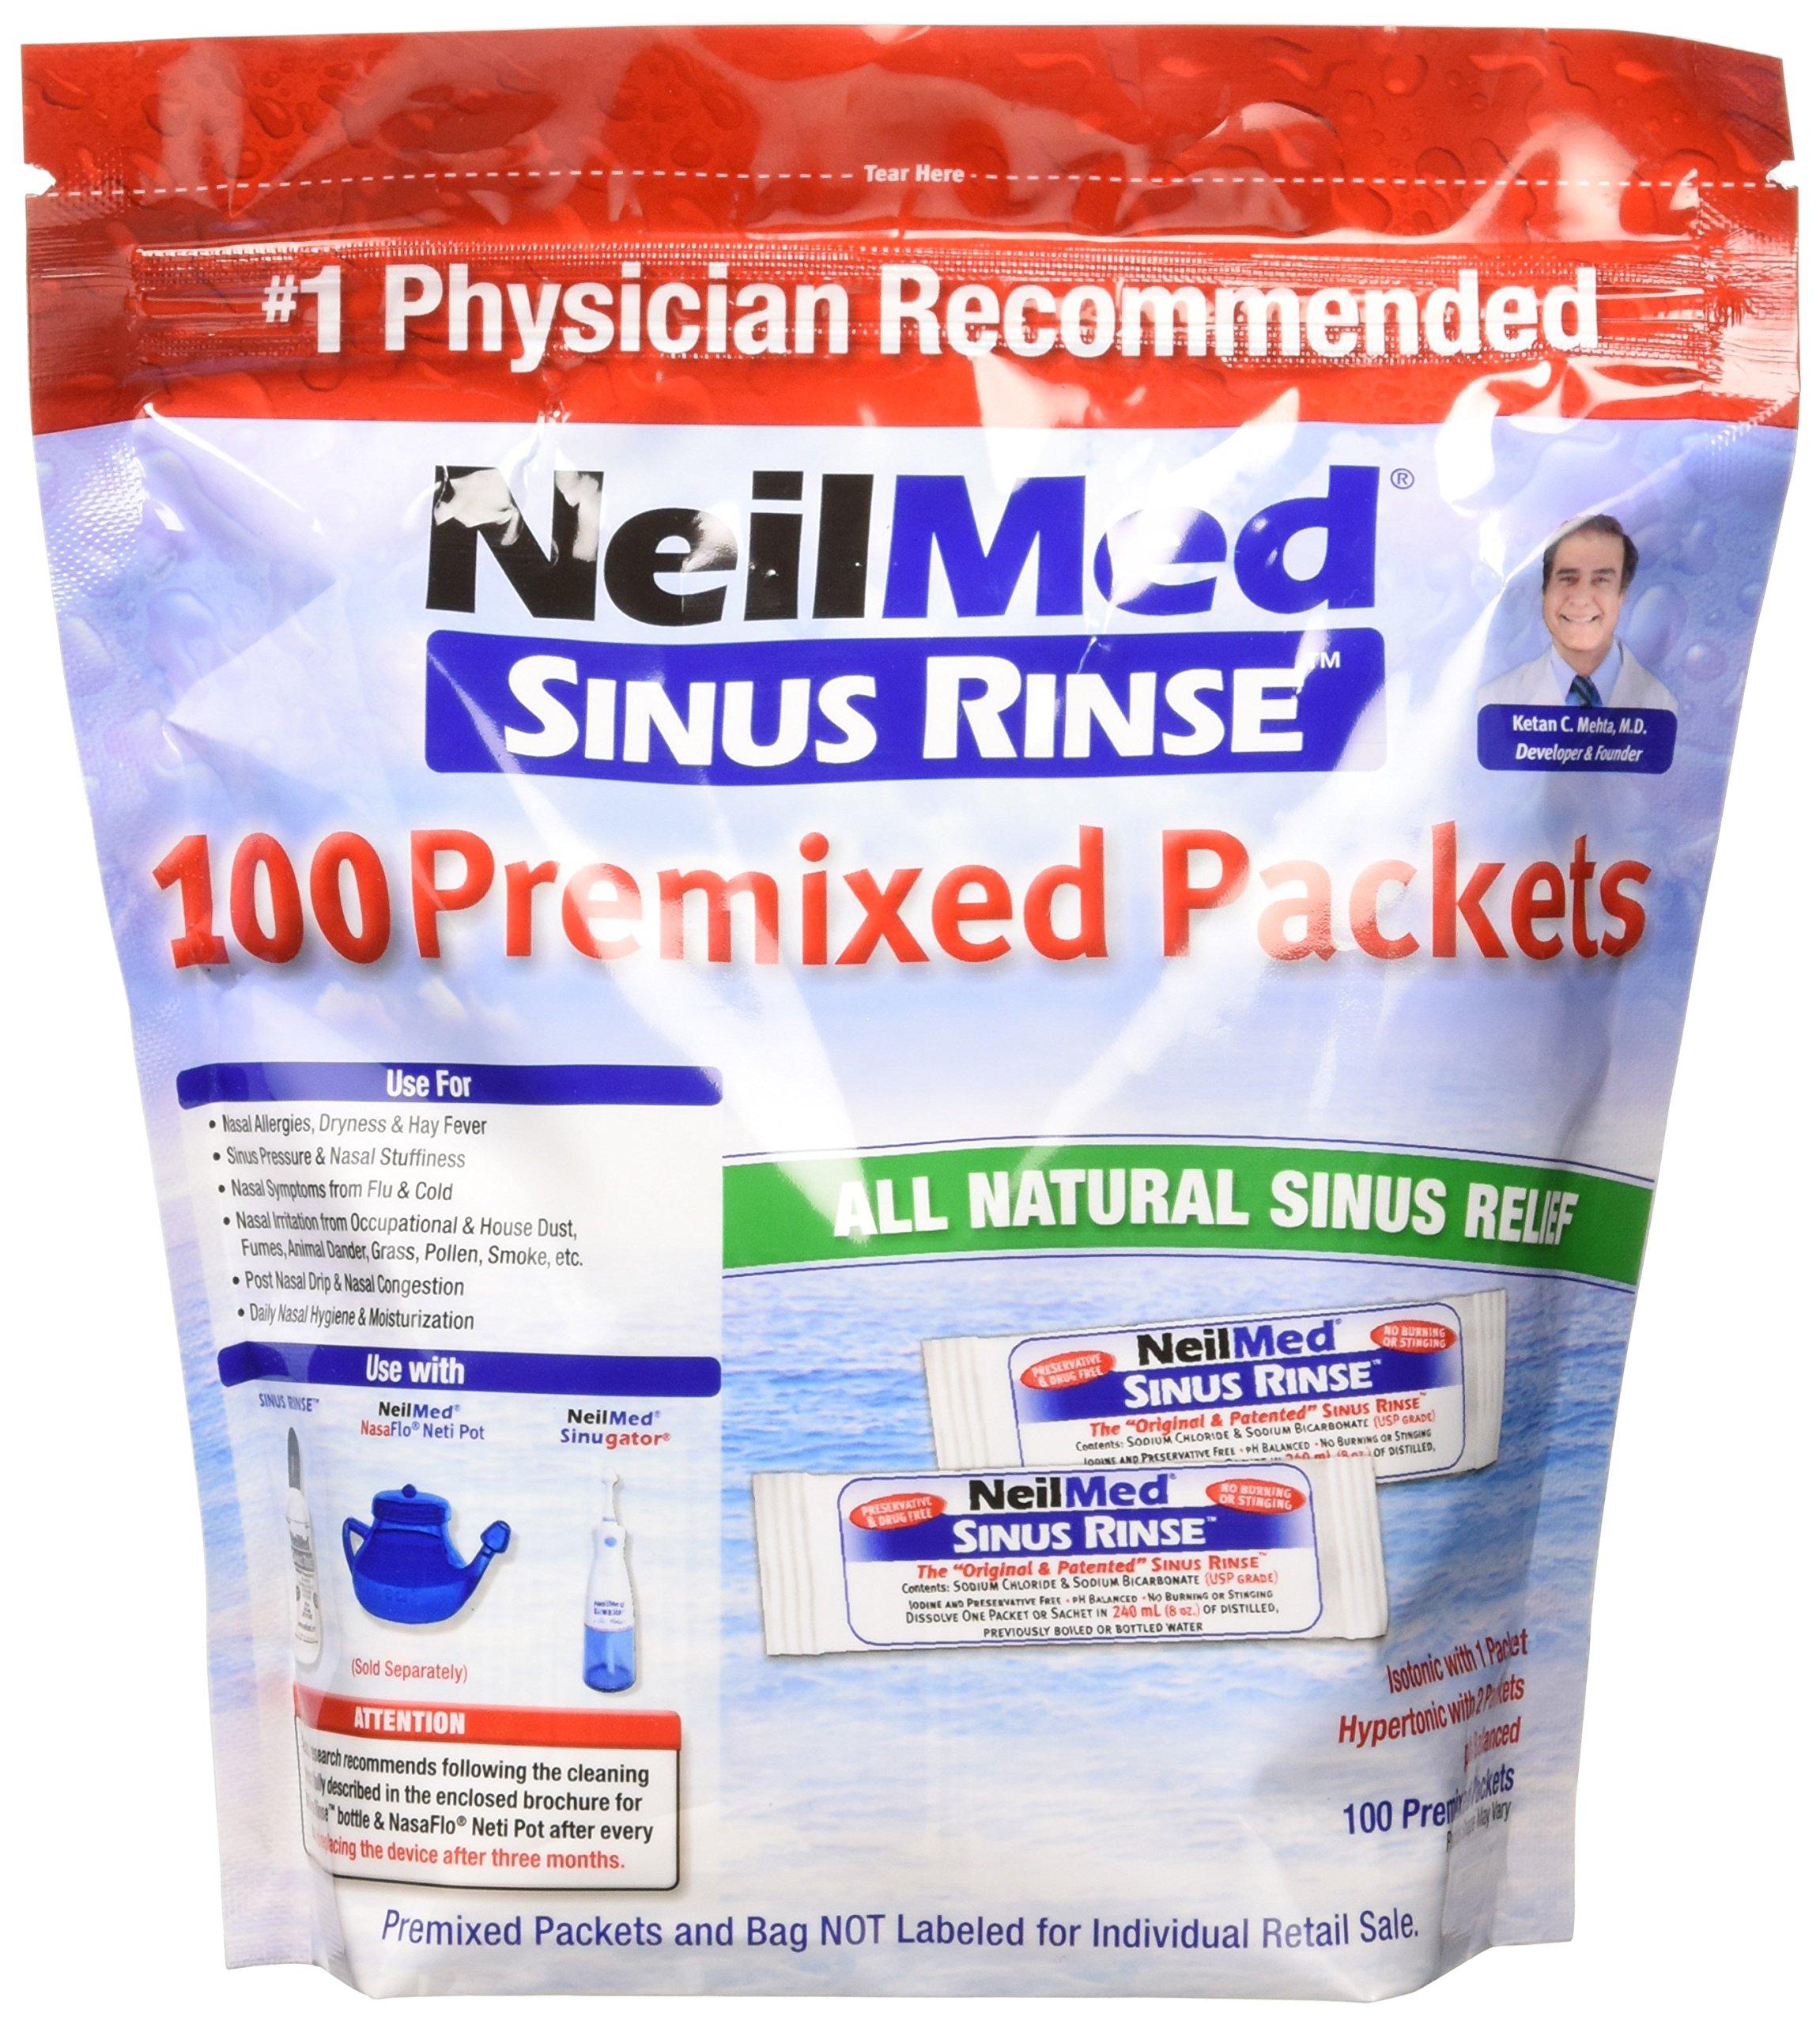 NeilMed Sinus Rinse Premixed Refill Packets 100 ct.